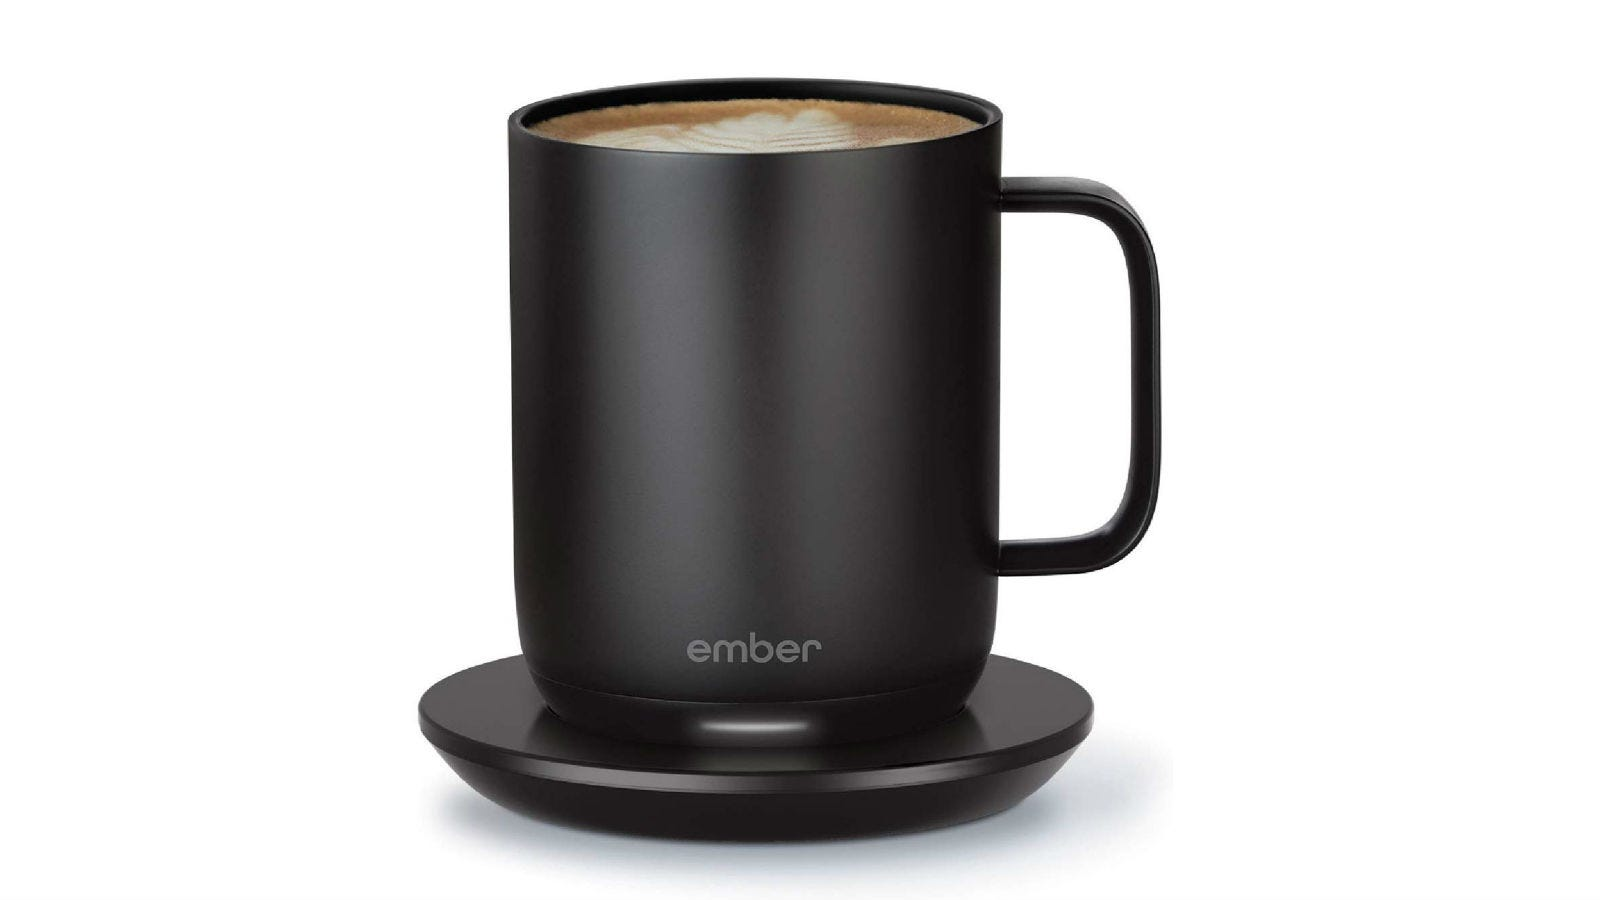 Ember Temperature Smart Control Mug 2